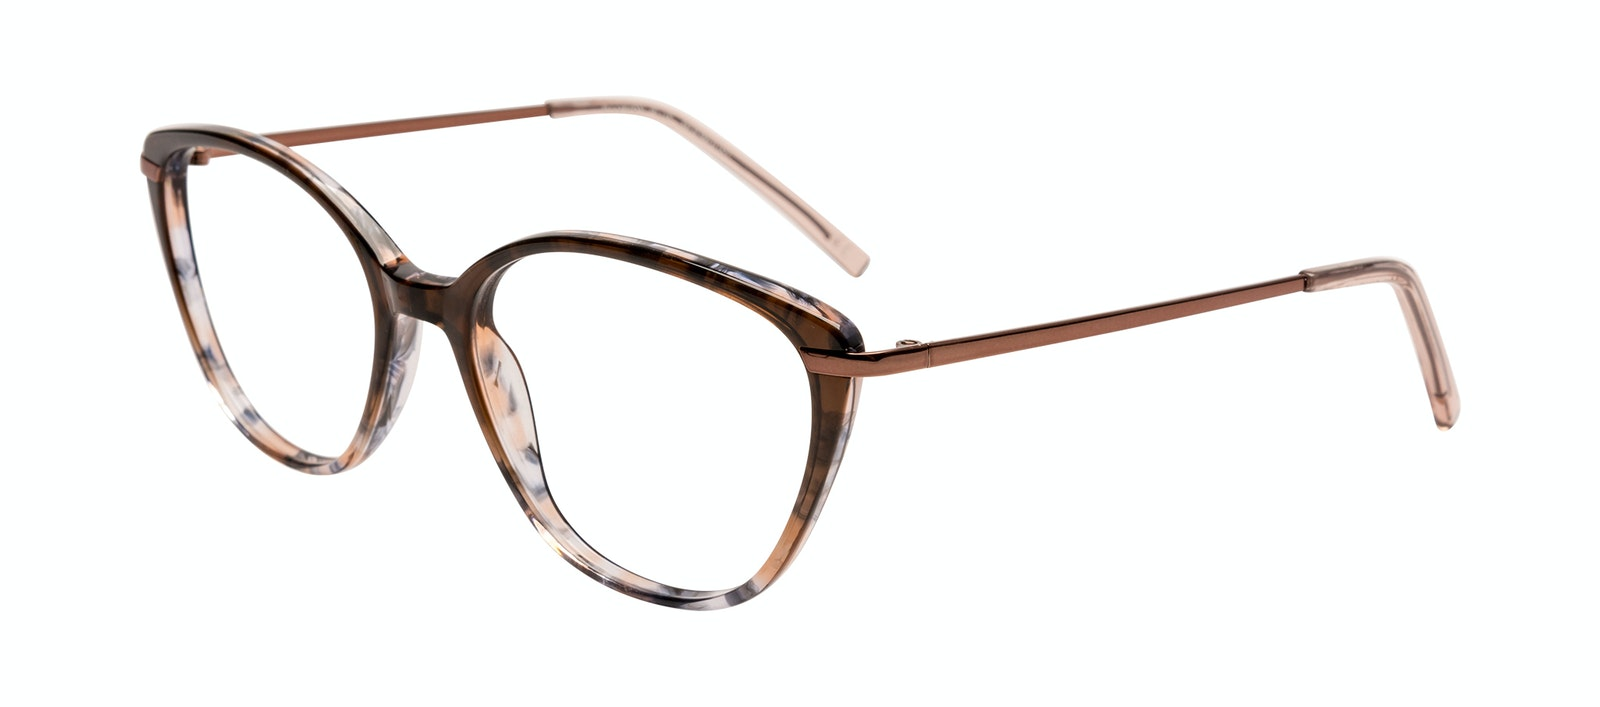 Affordable Fashion Glasses Eyeglasses Women Illusion Plus Moondust Tilt